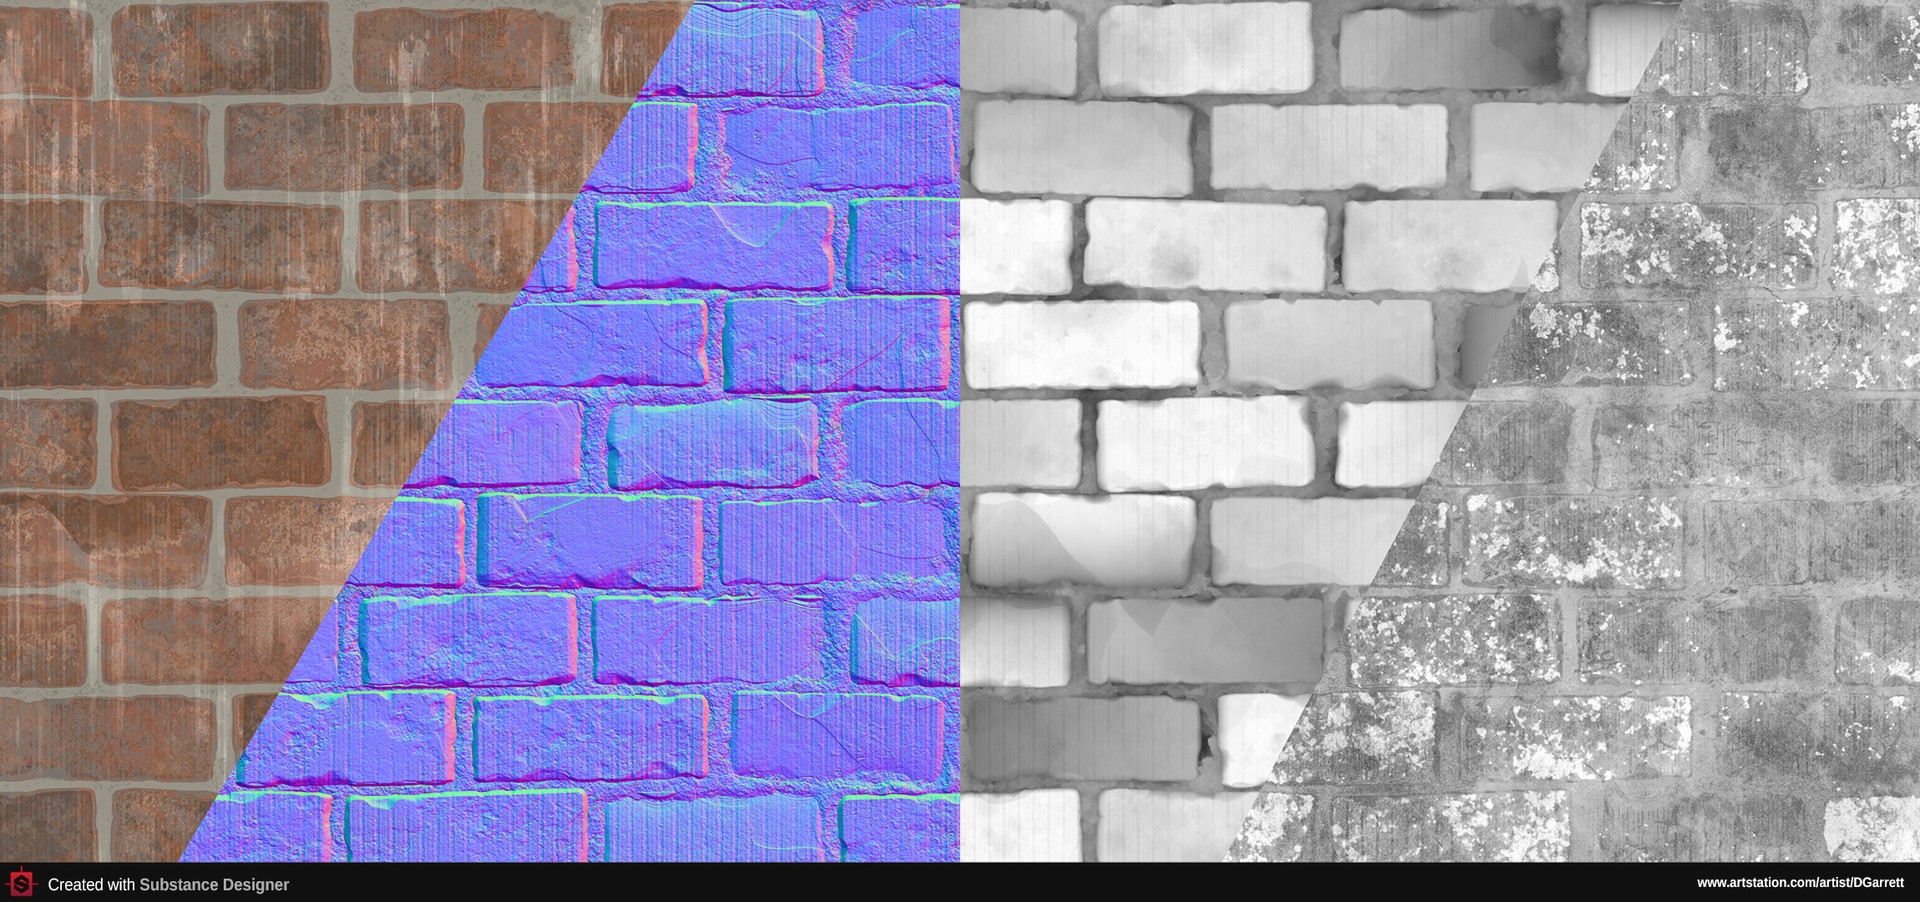 David garrett david garrett brick2